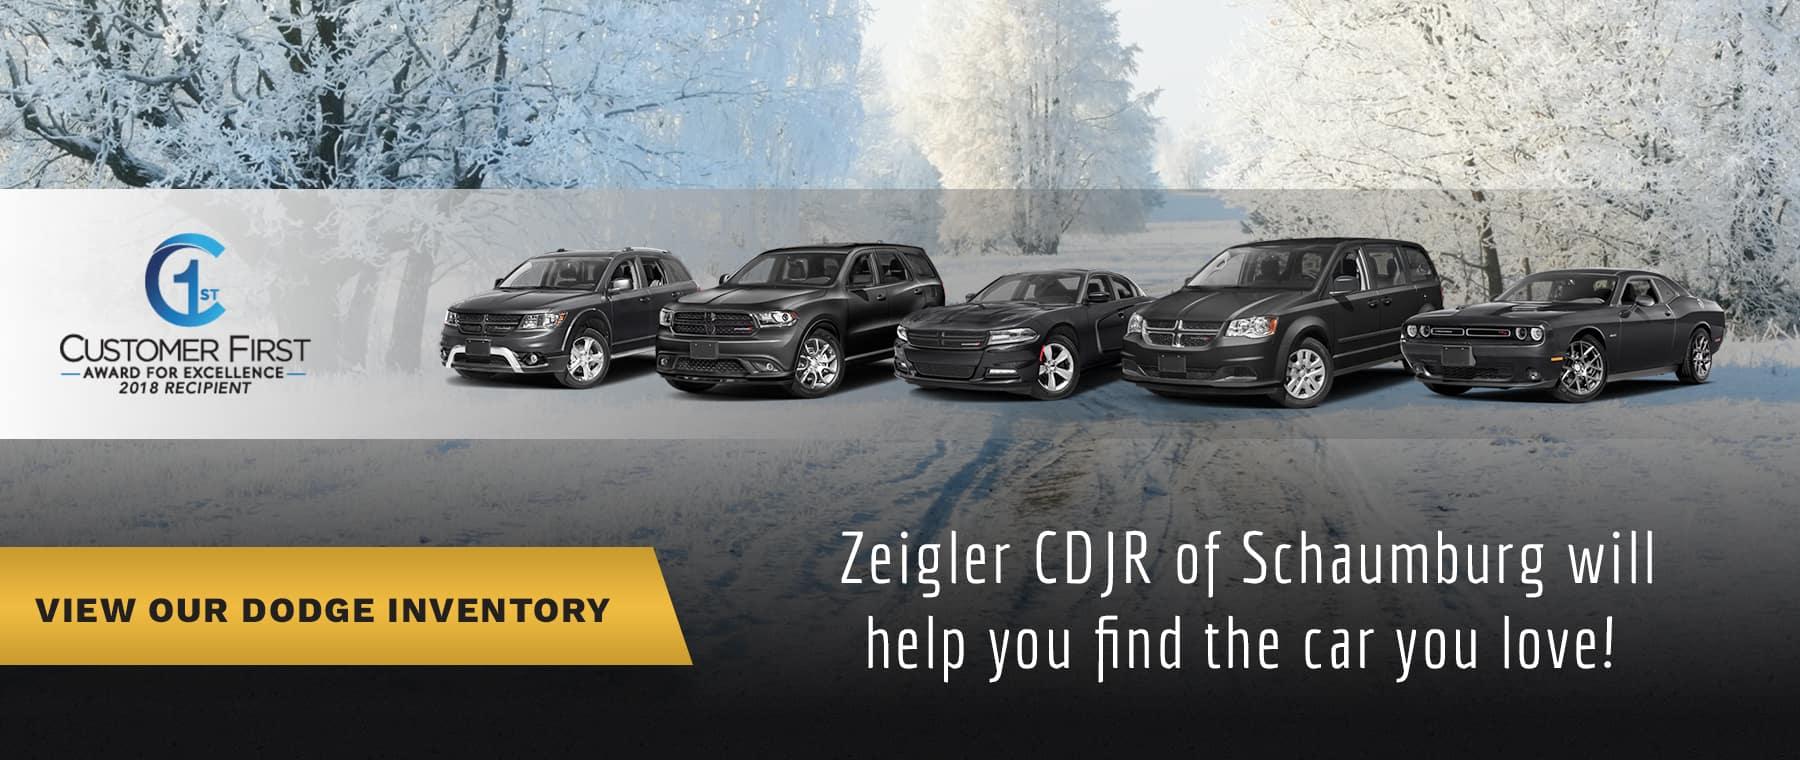 Customer First Dodge Image